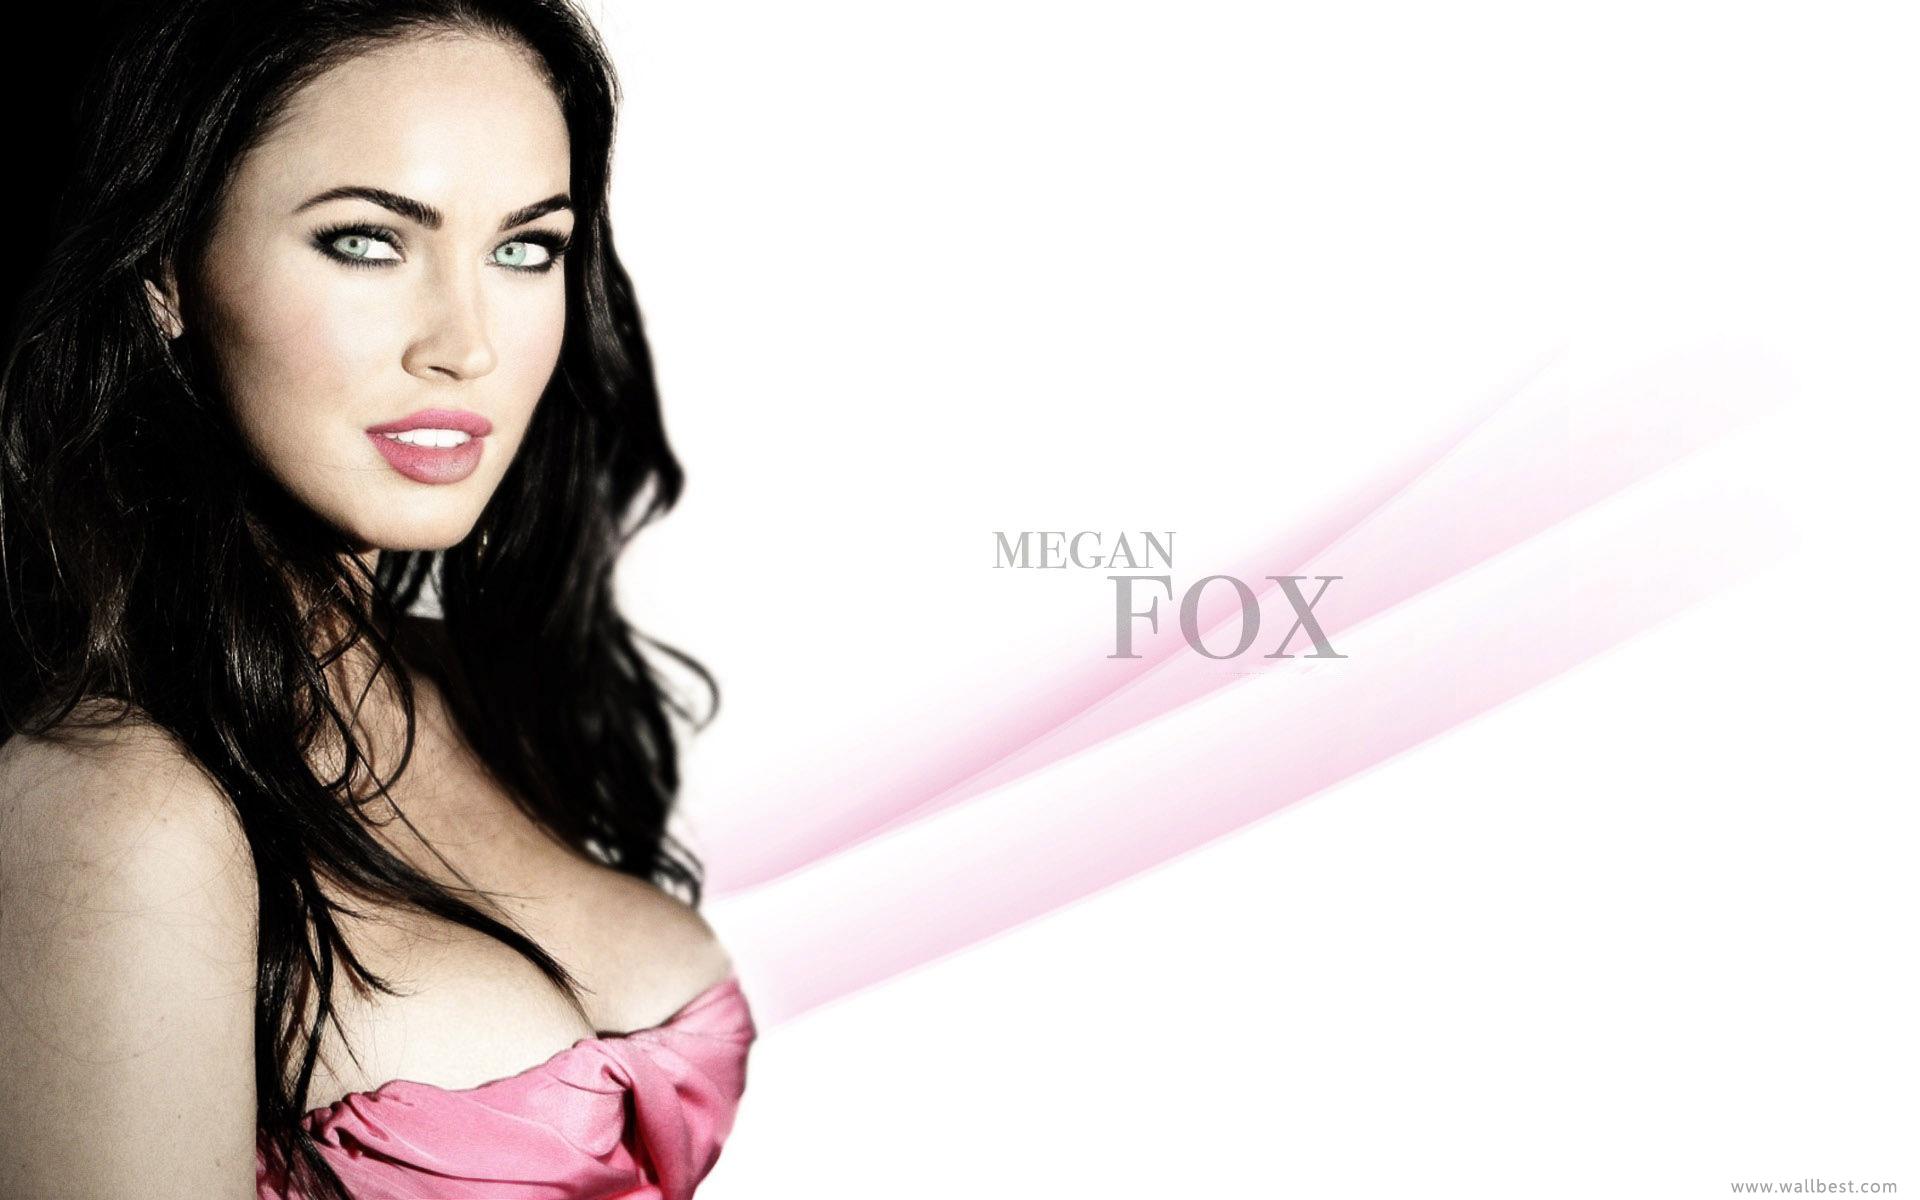 Celebrity Megan Fox Wallpaper For Desktop 1920x1200